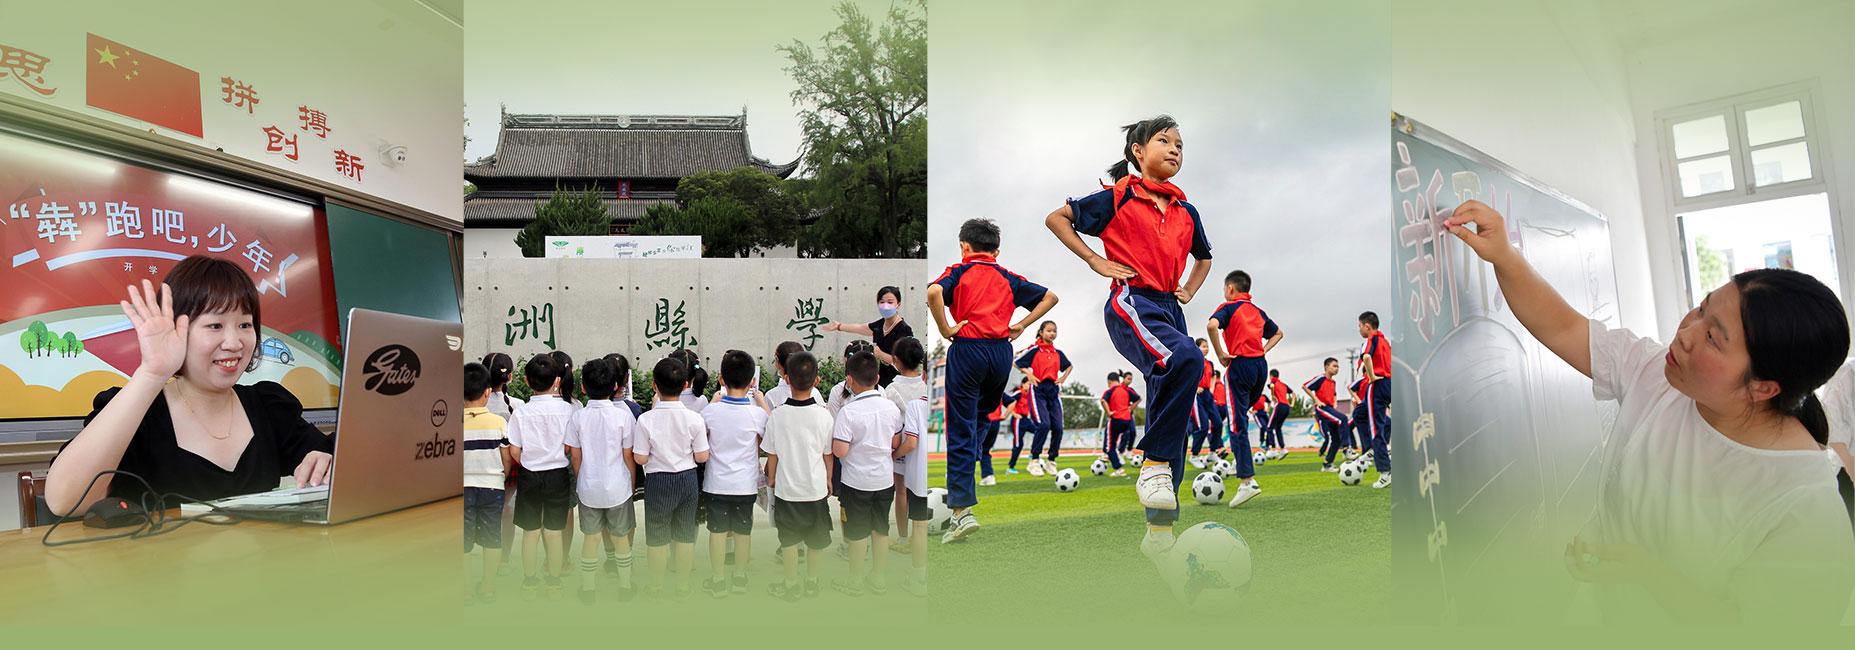 Xi's new era thought set for schools